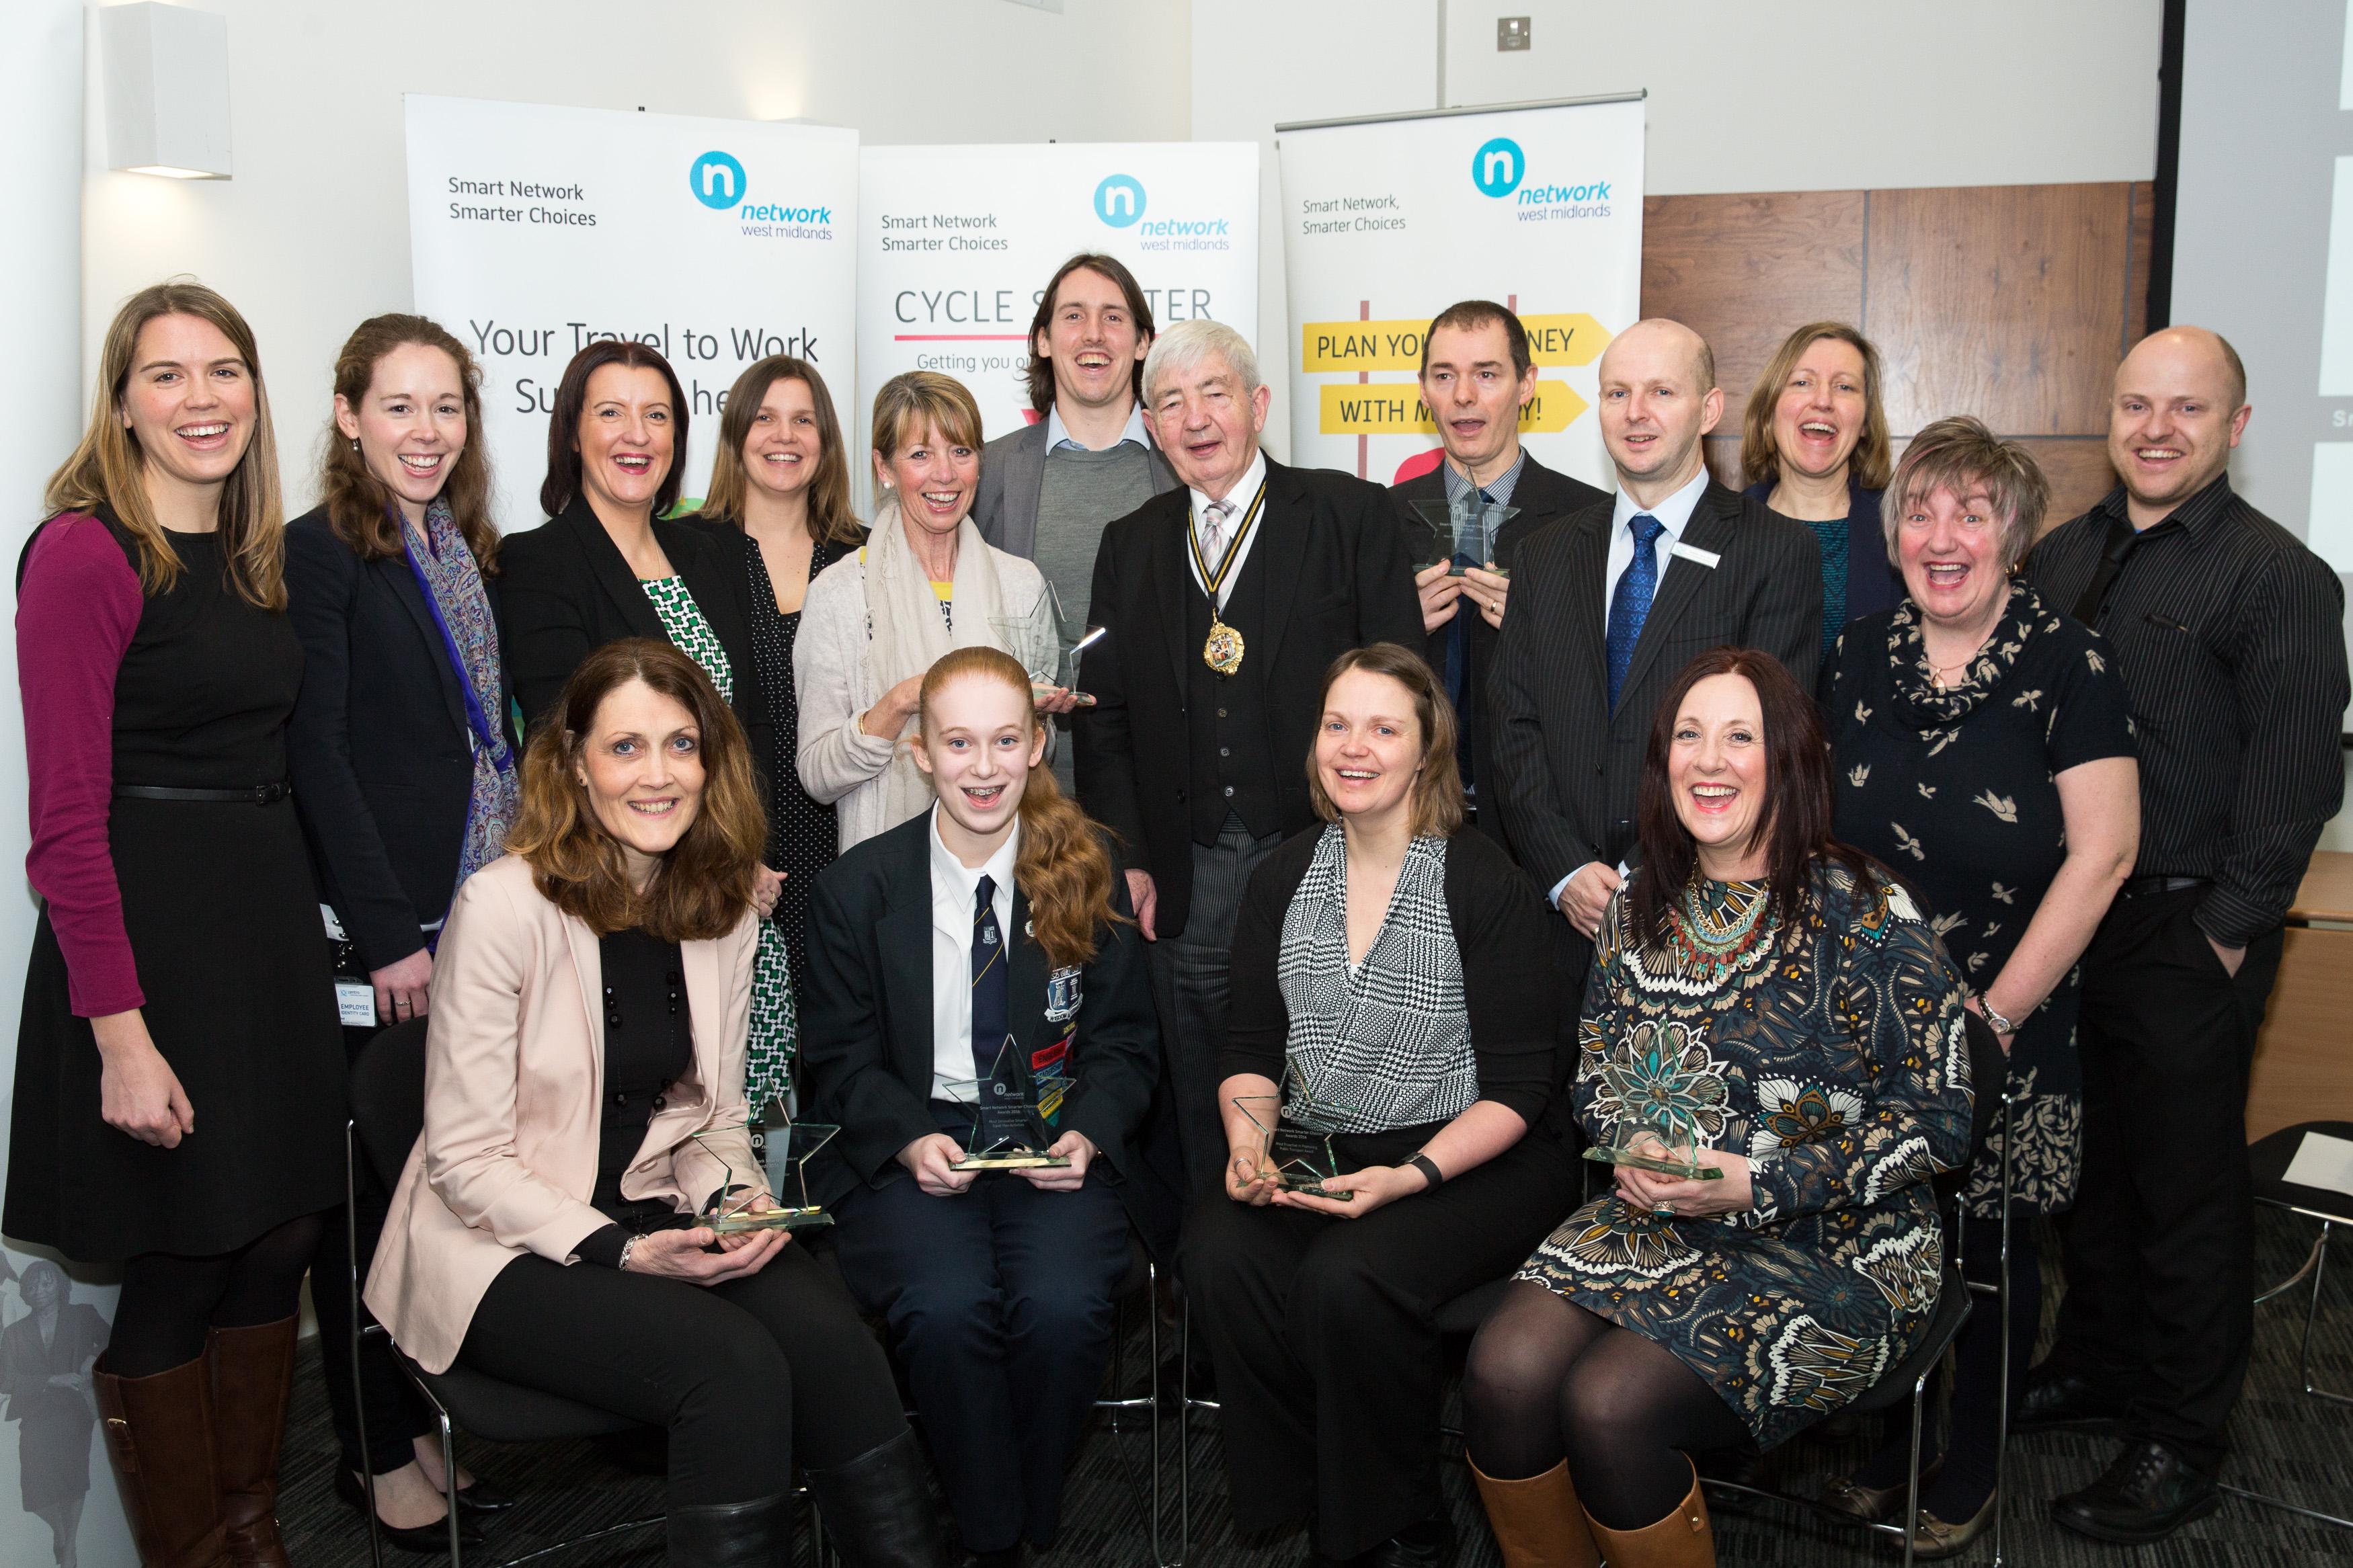 Lord Mayor Cllr Raymond Hassall with award winners.